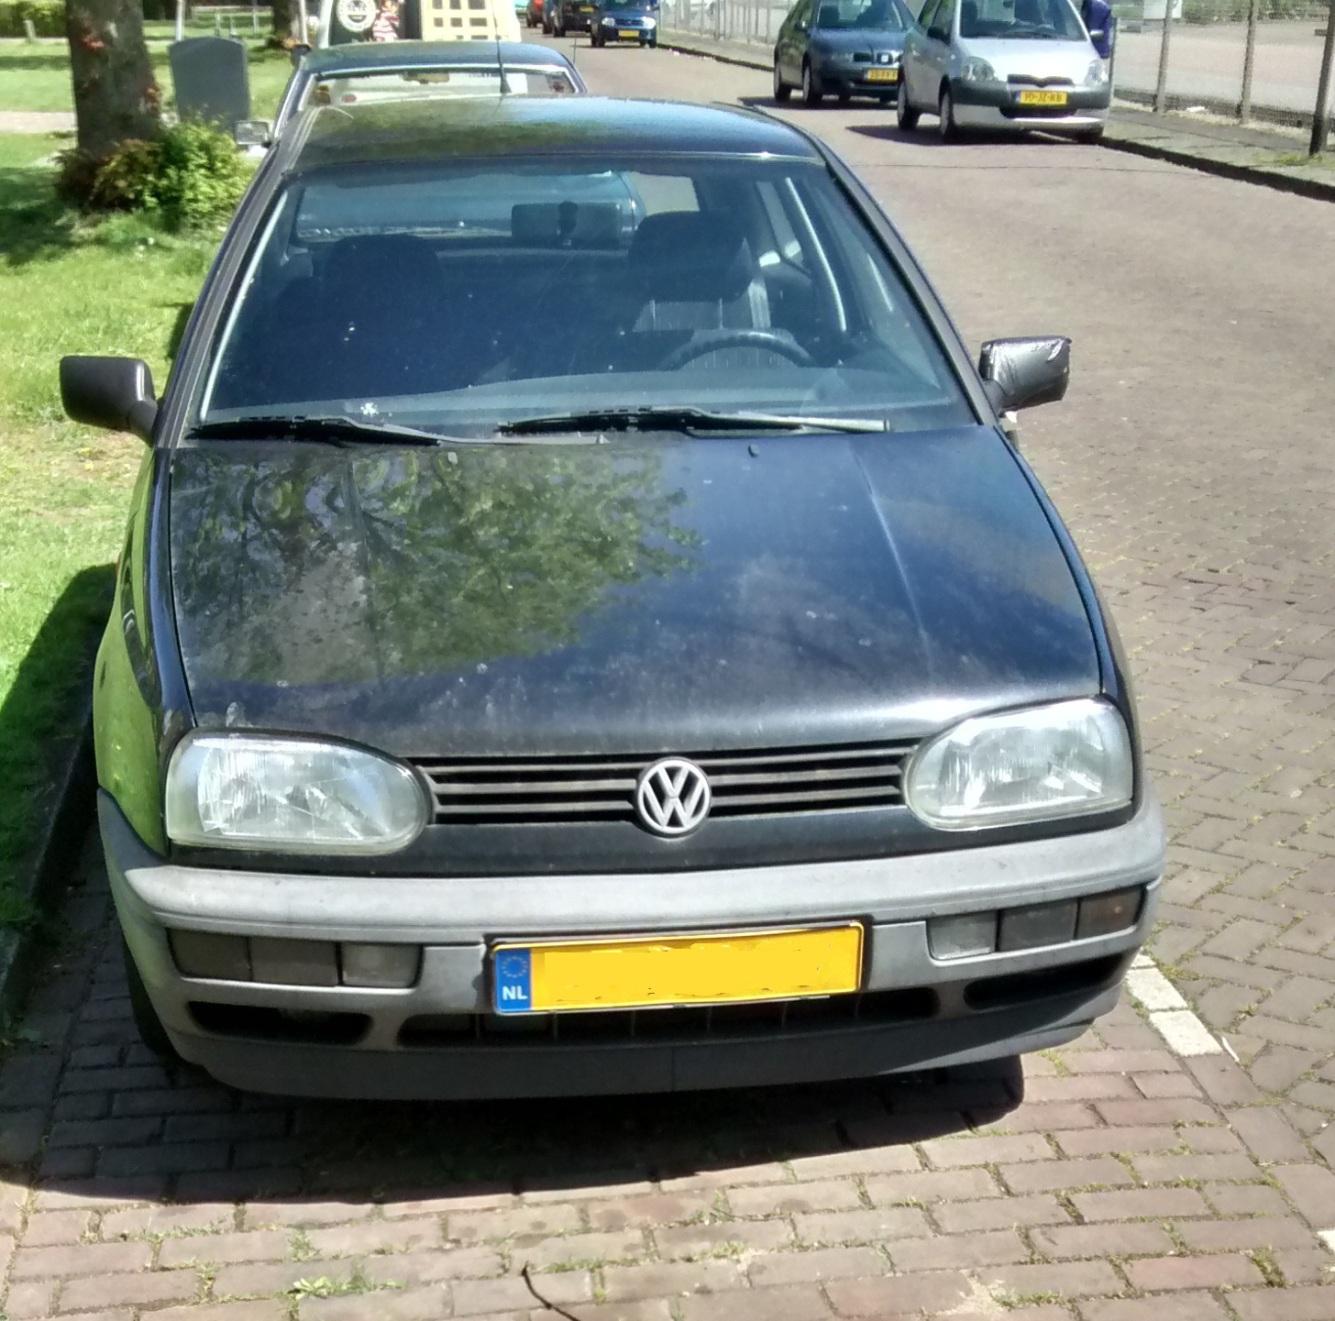 Auto carcrash 2